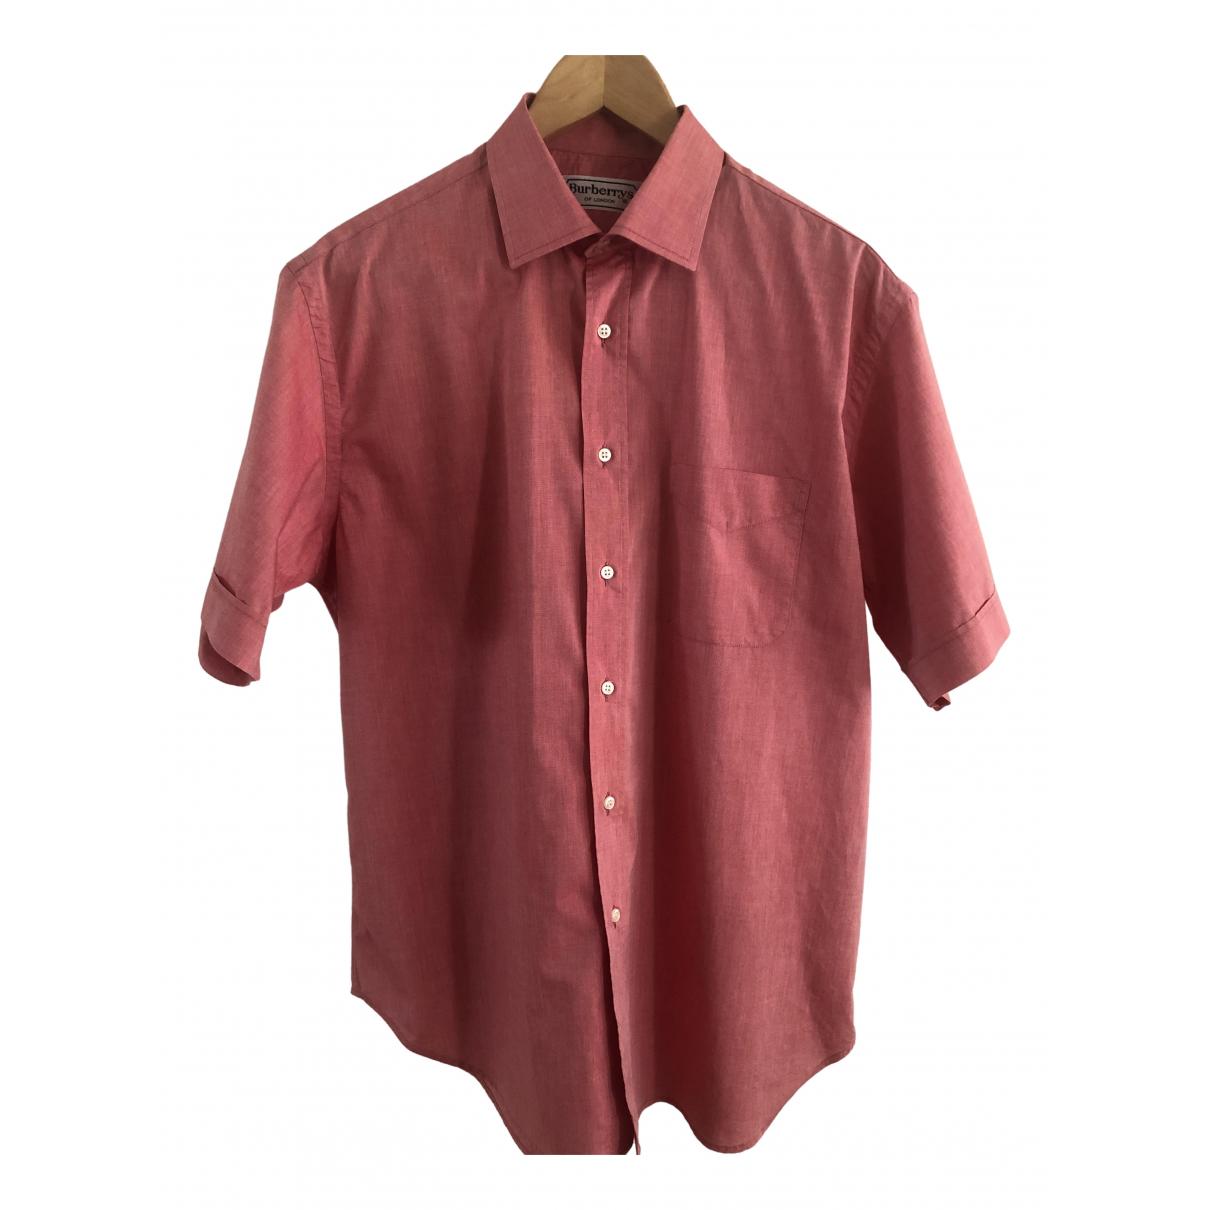 Burberry \N Cotton Shirts for Men 16 UK - US (tour de cou / collar)